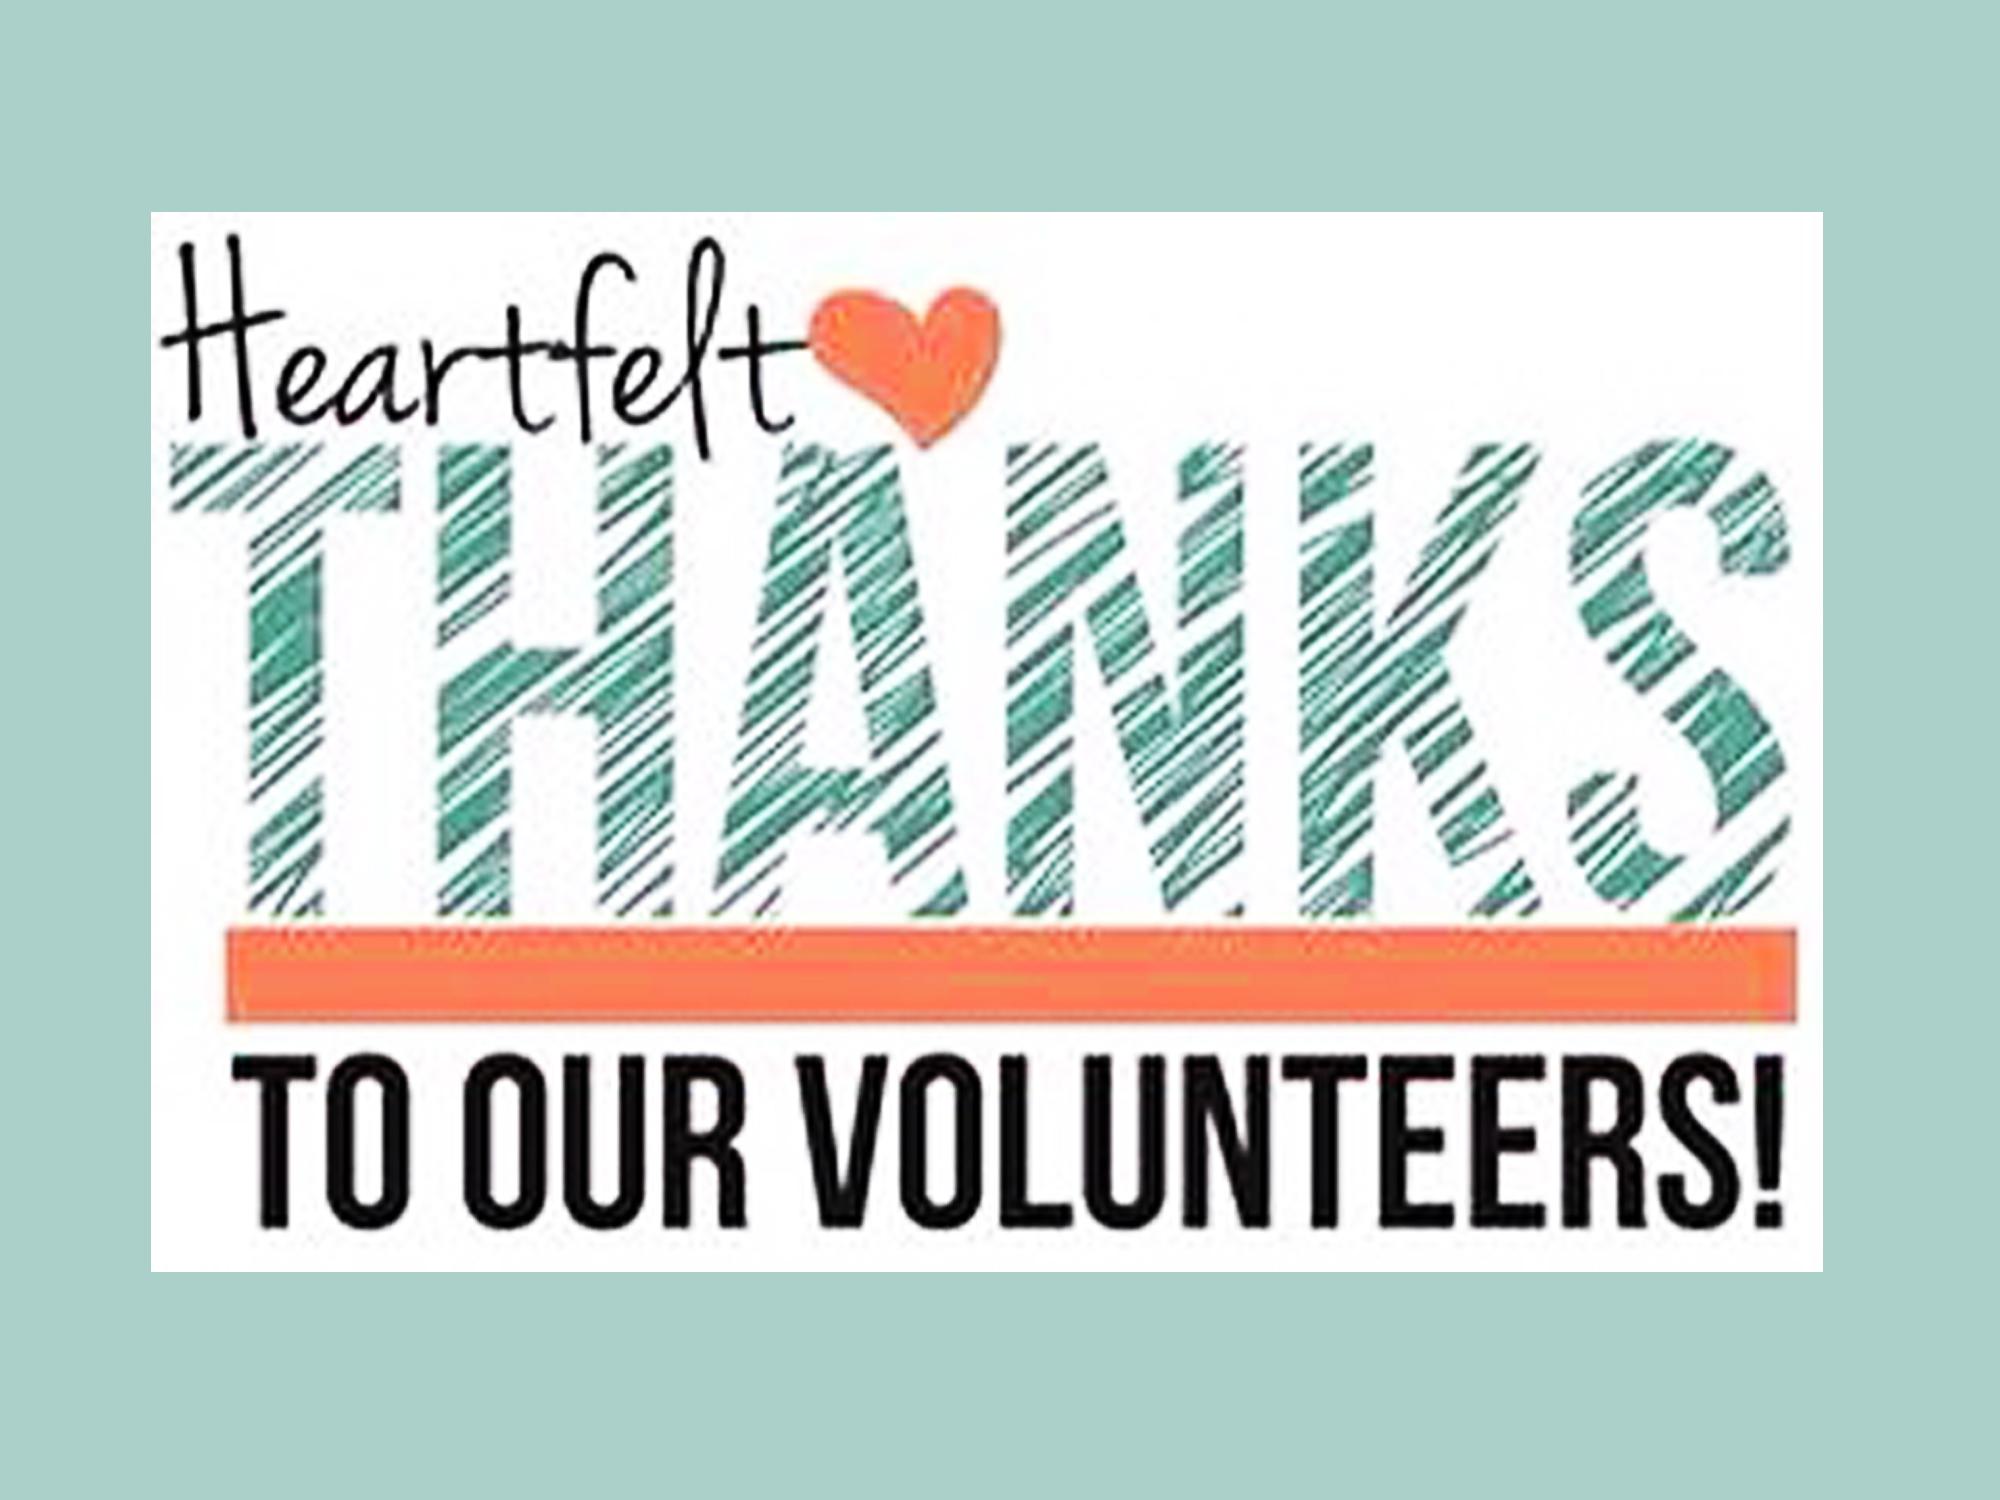 Heartfelt Thanks to our Volunteers